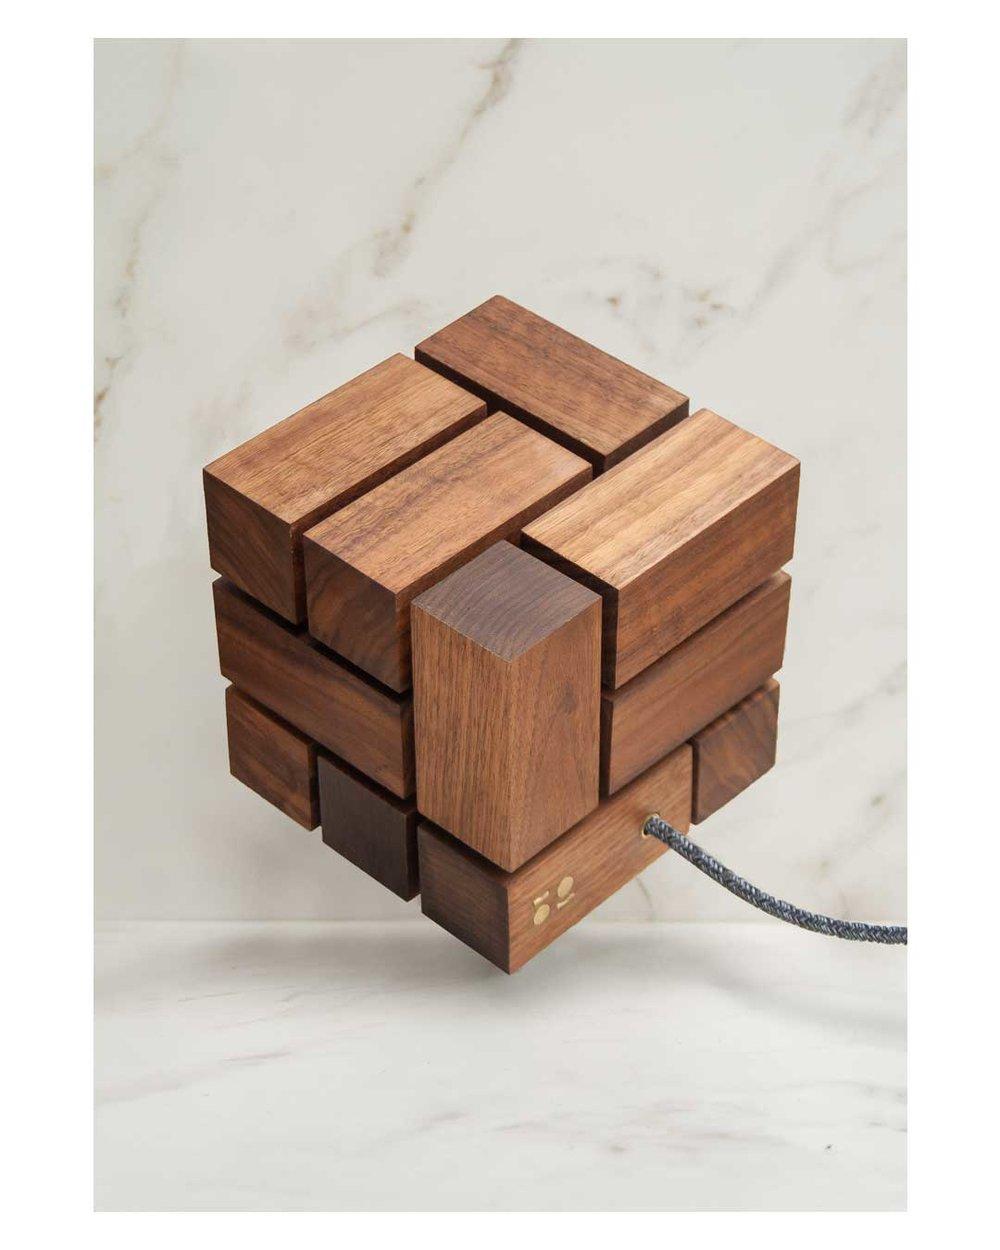 cube-crop-2.jpg